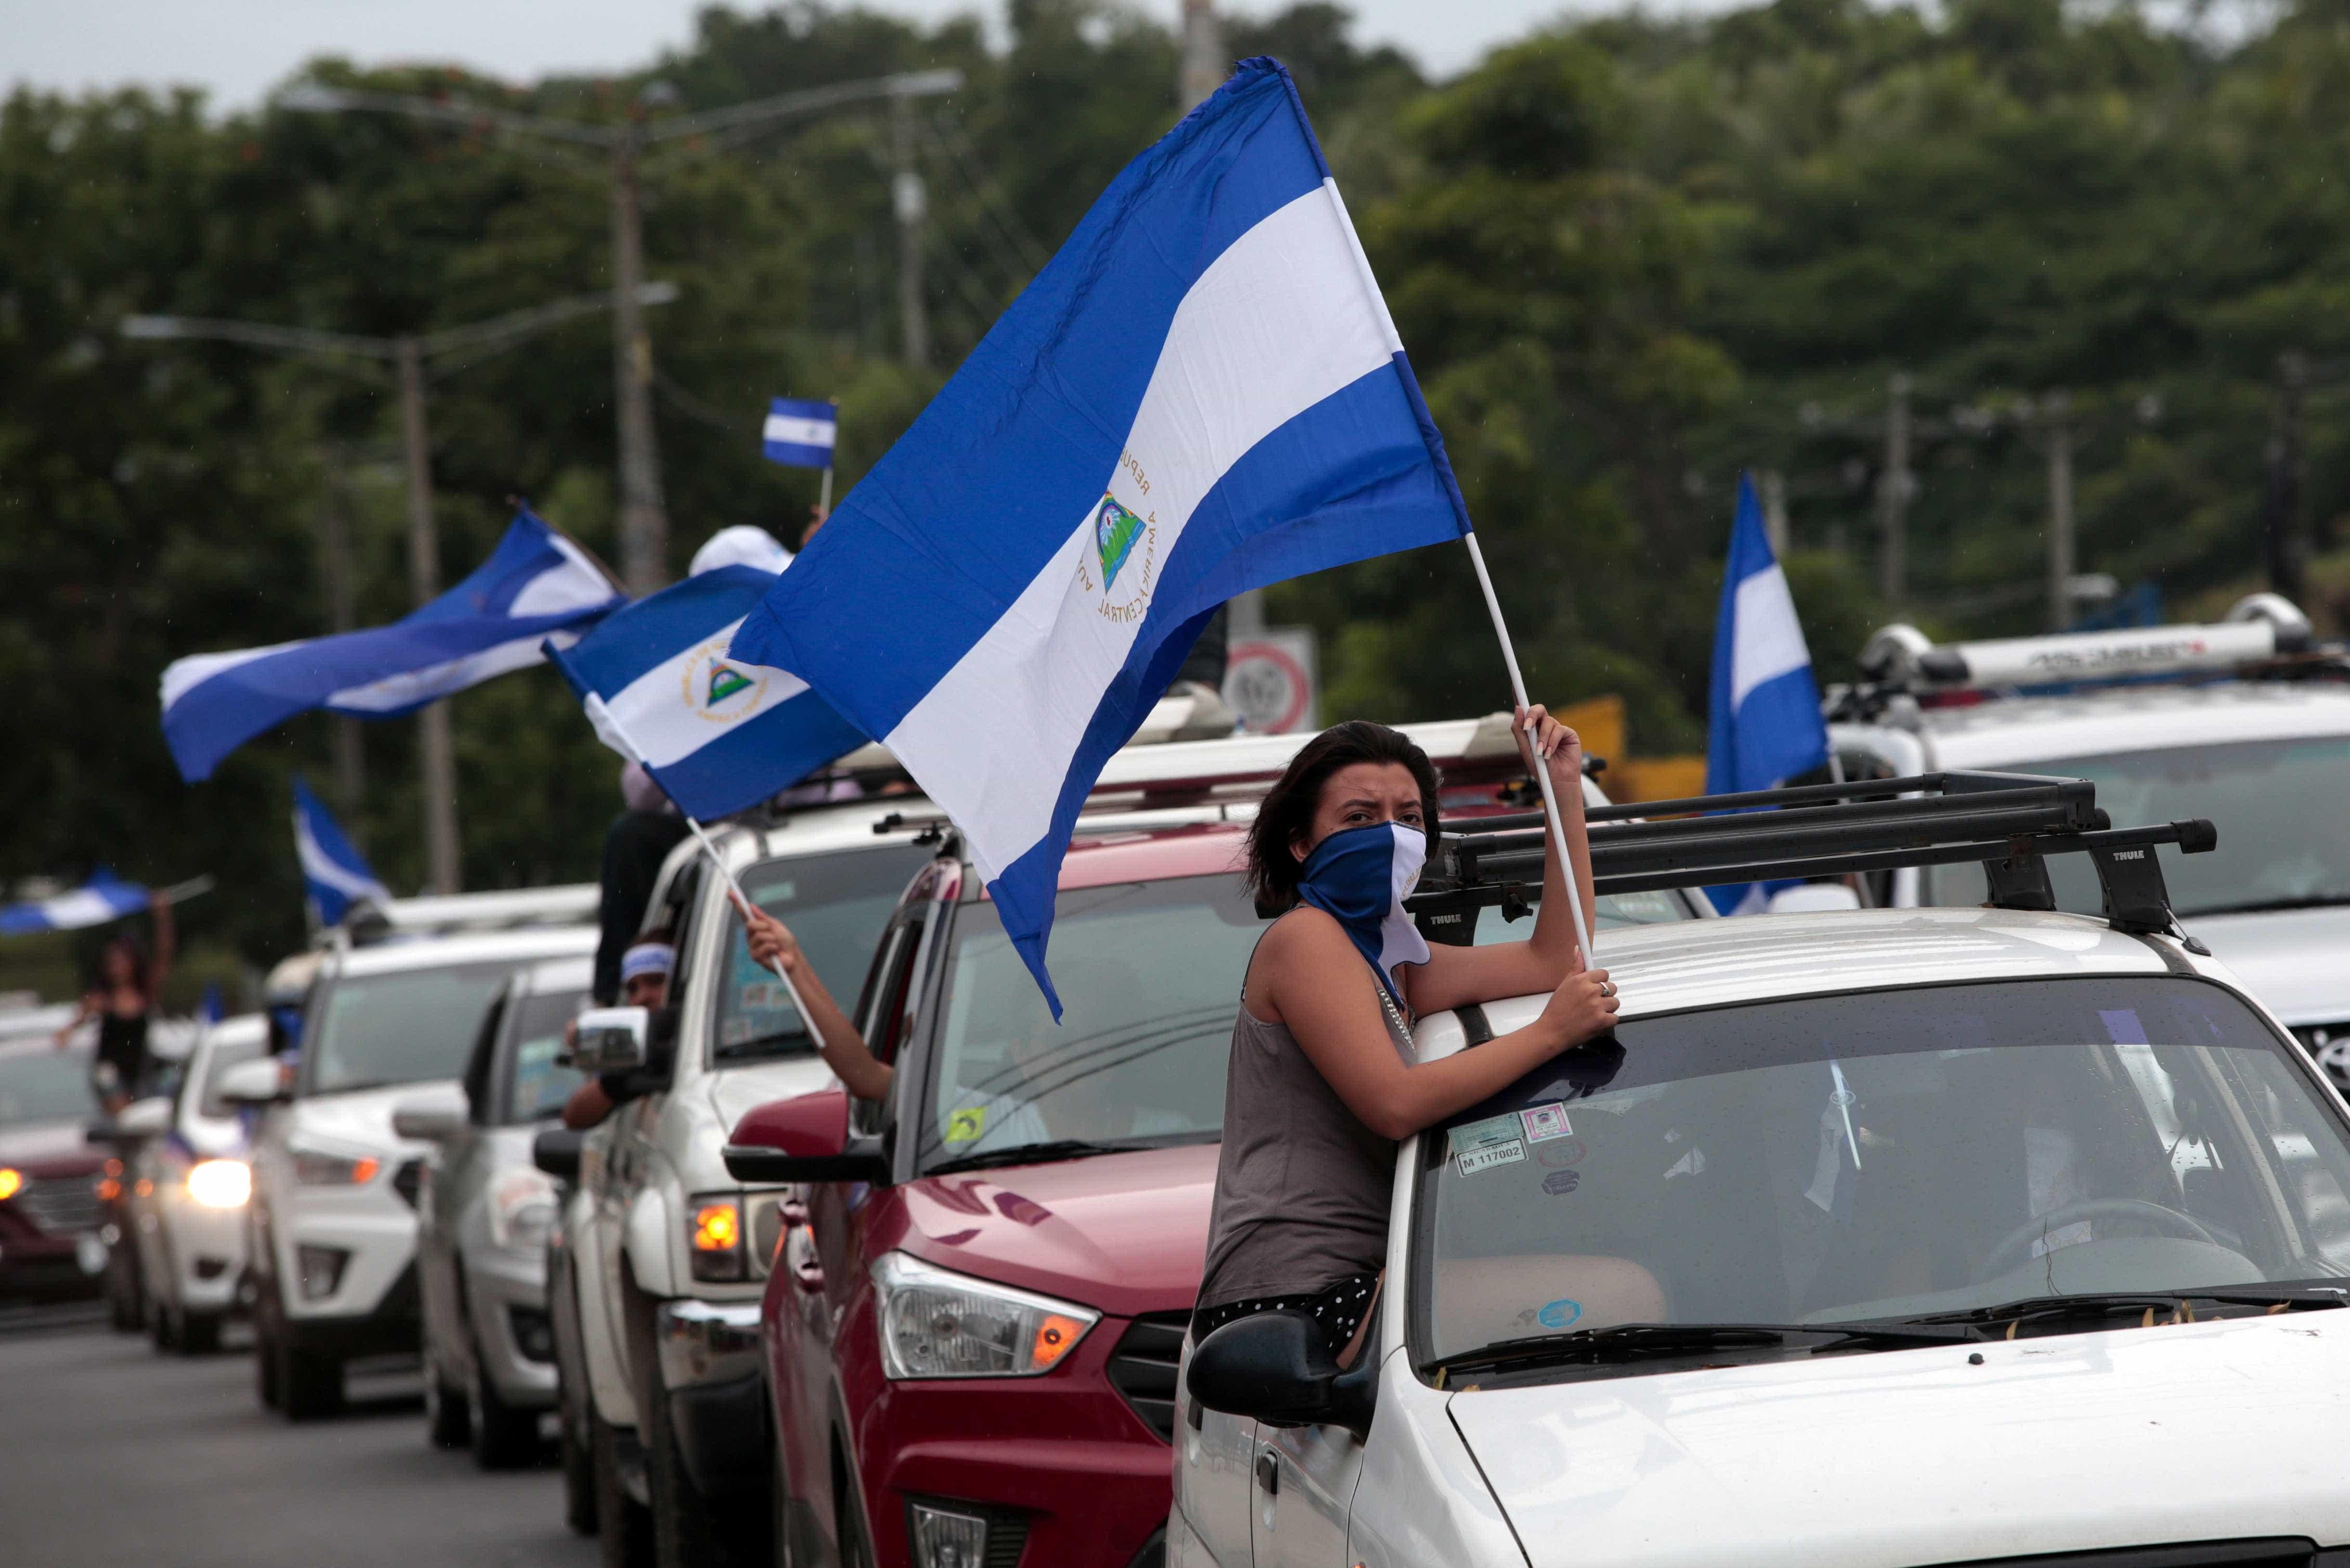 OEA se reúne para discutir crise na Nicarágua